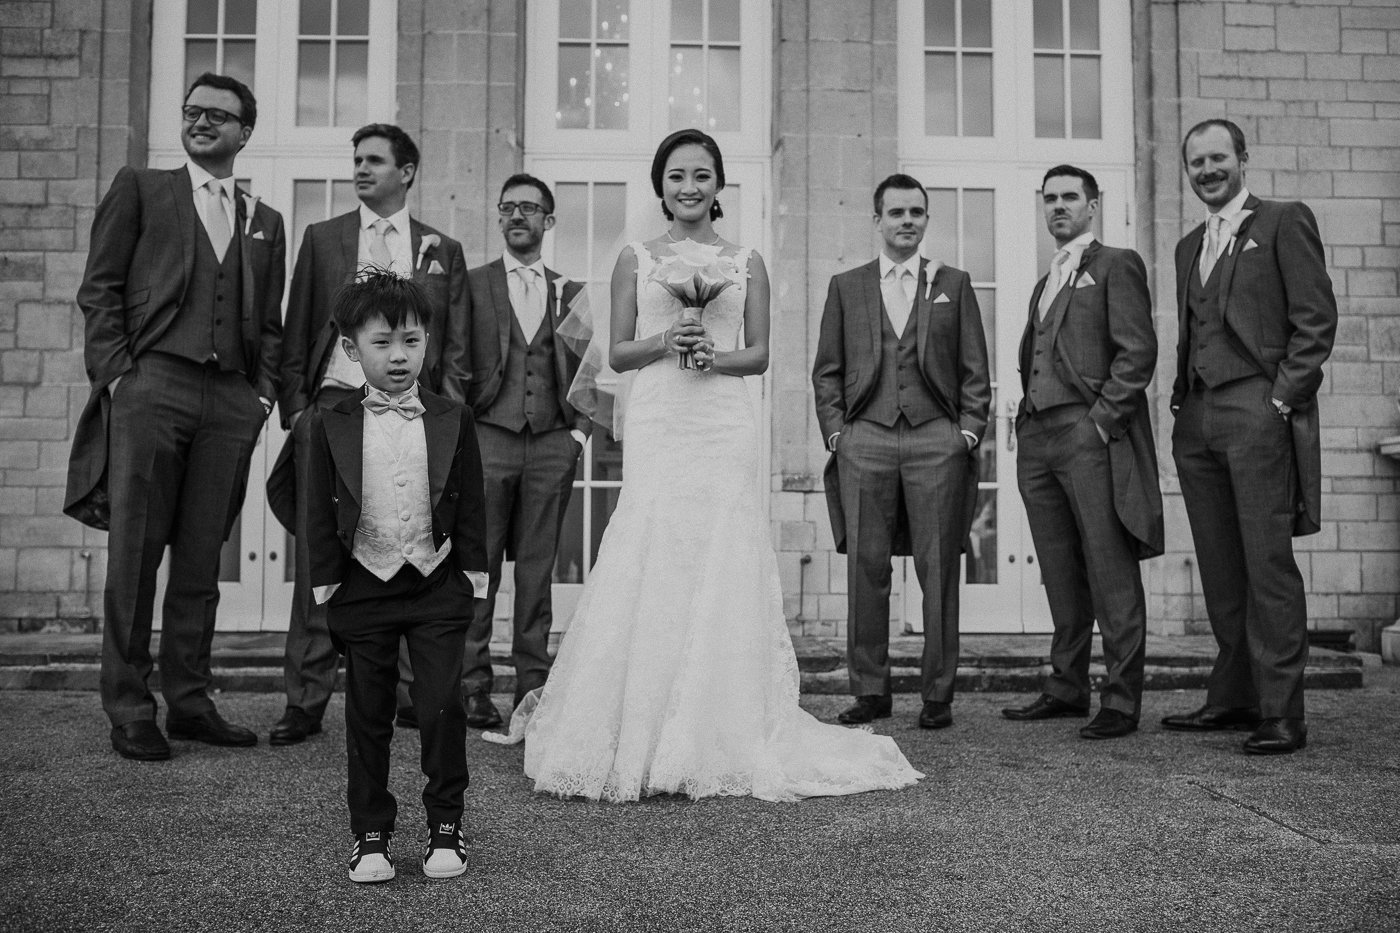 froyle-park-wedding-photography-24.jpg